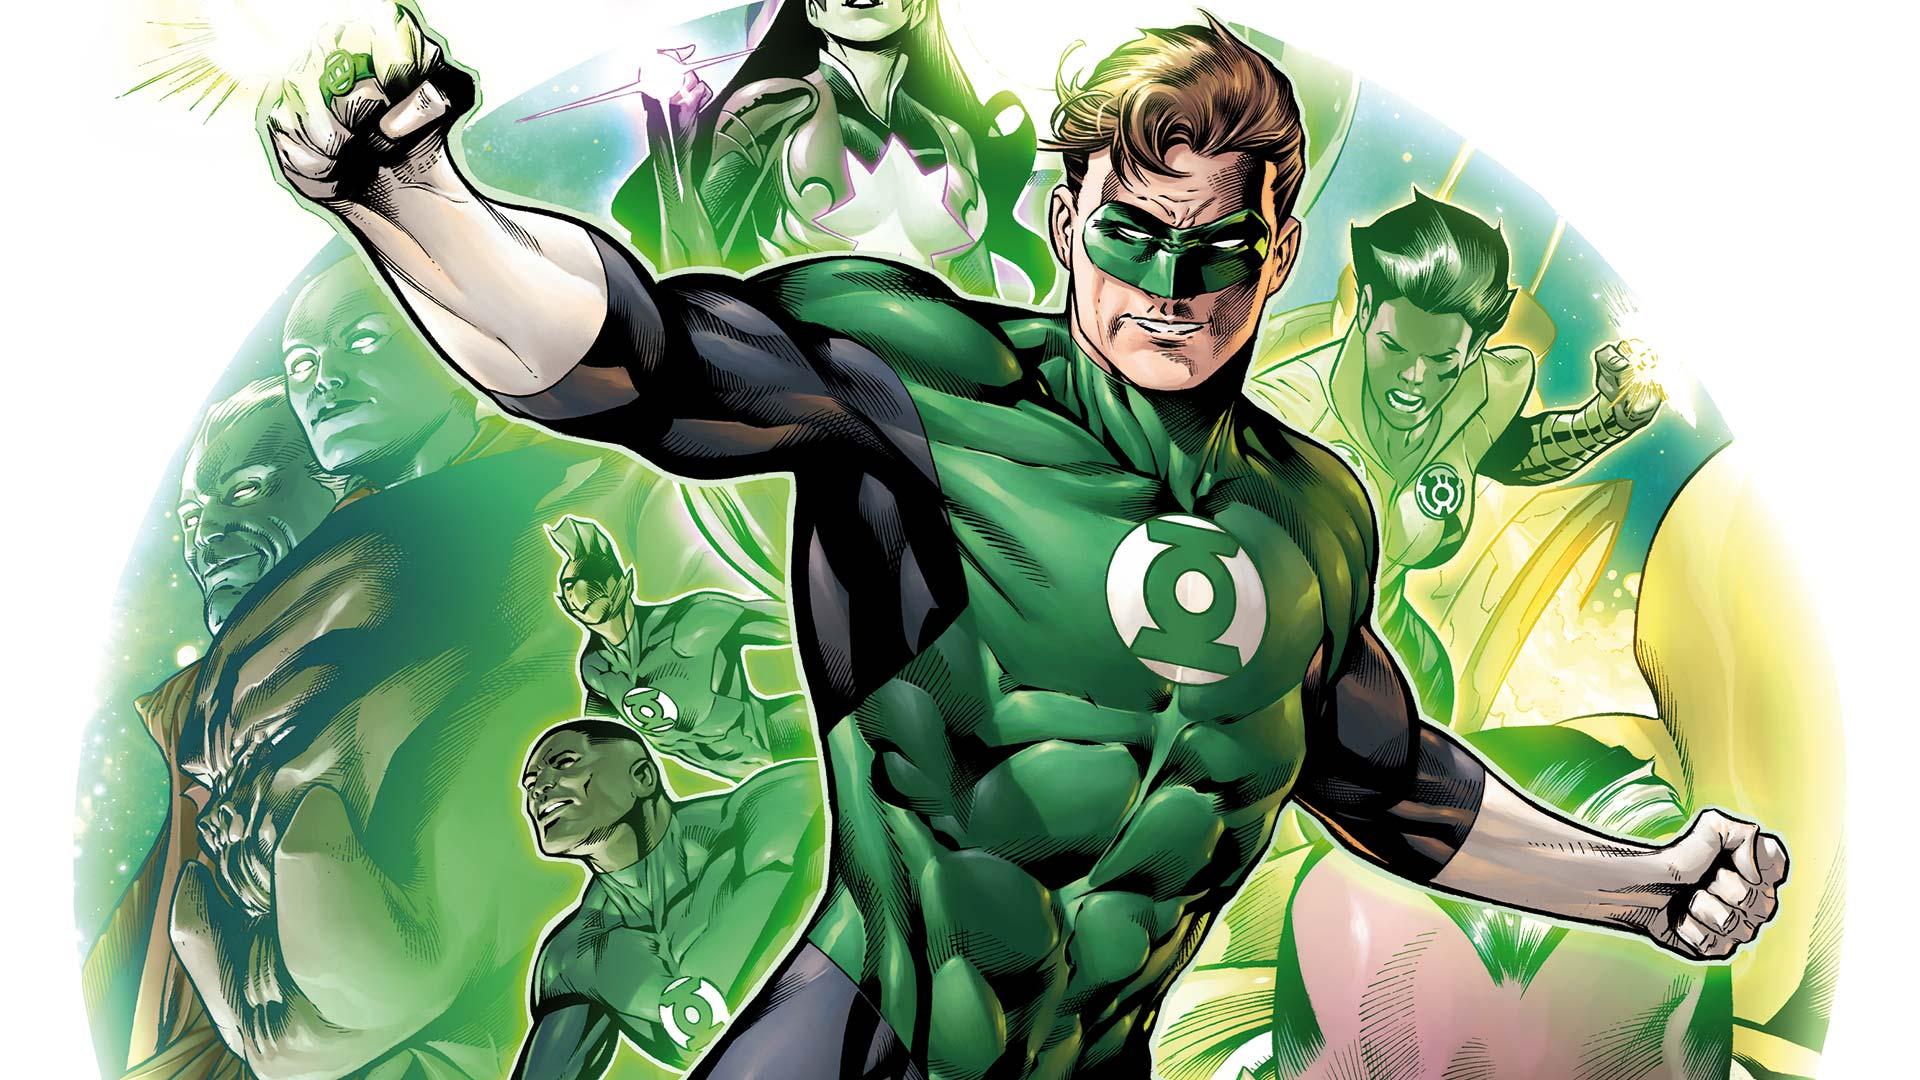 High Resolution Wallpaper | Green Lantern 1920x1080 px